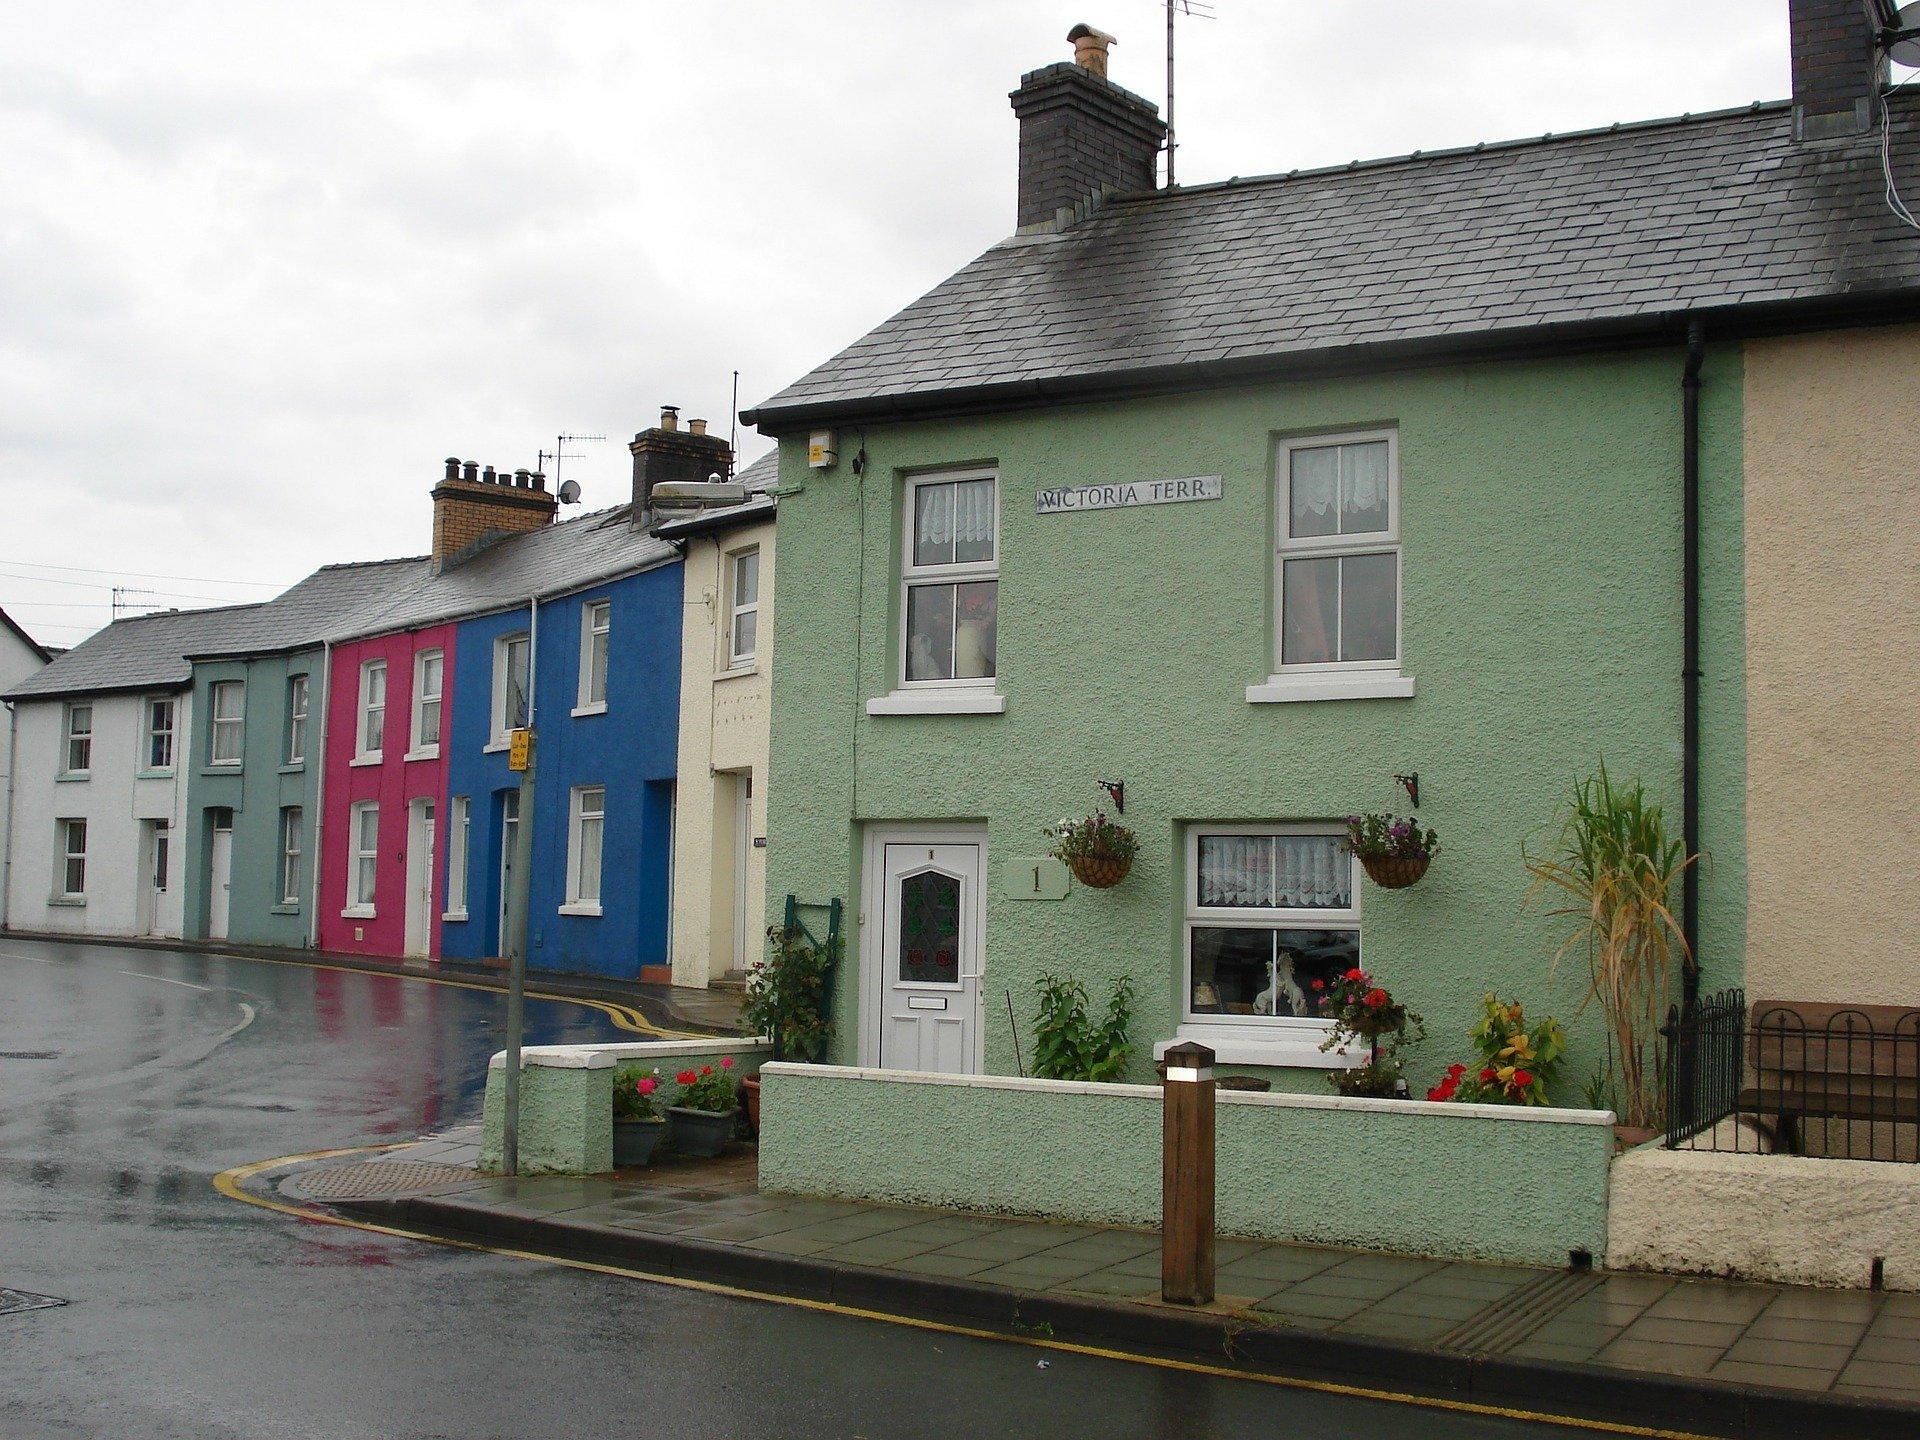 Terraced House for a RIC Survey